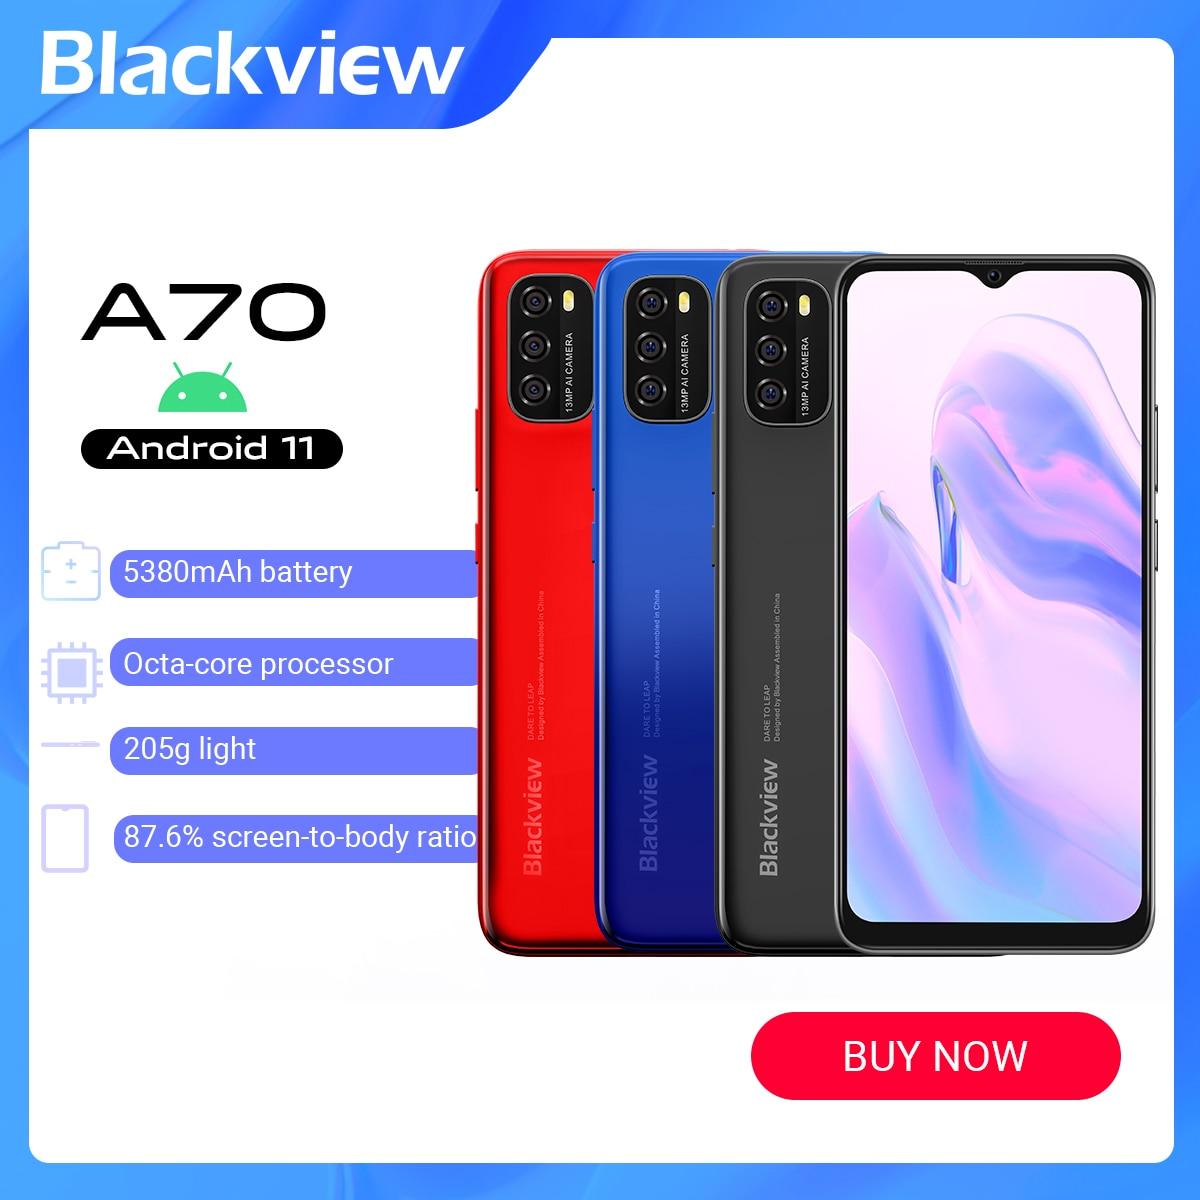 Blackview A70 Android 11 смартфон Оперативная память 3 Гб оперативной памяти, Встроенная память 32GB LTE 4G 6,517 дюймовый смартфон Octa Core отпечатков пальцев р...